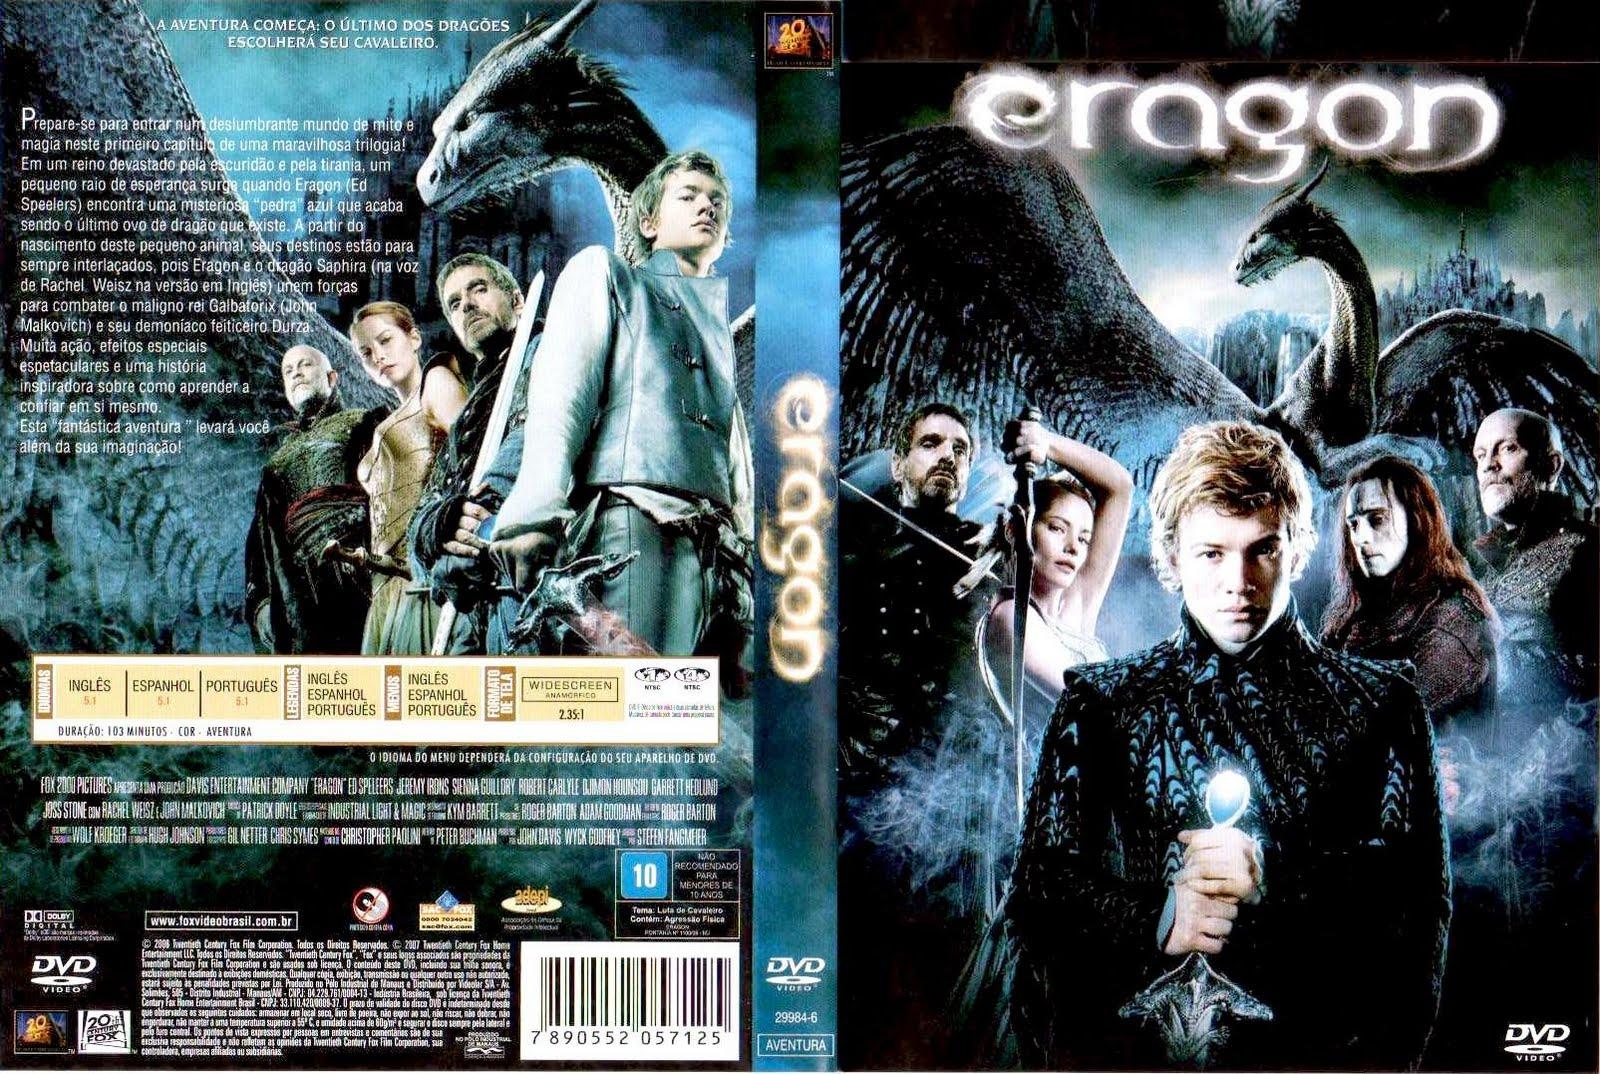 Dragões Para Sempre Amazing dj vini troca & venda de filmes